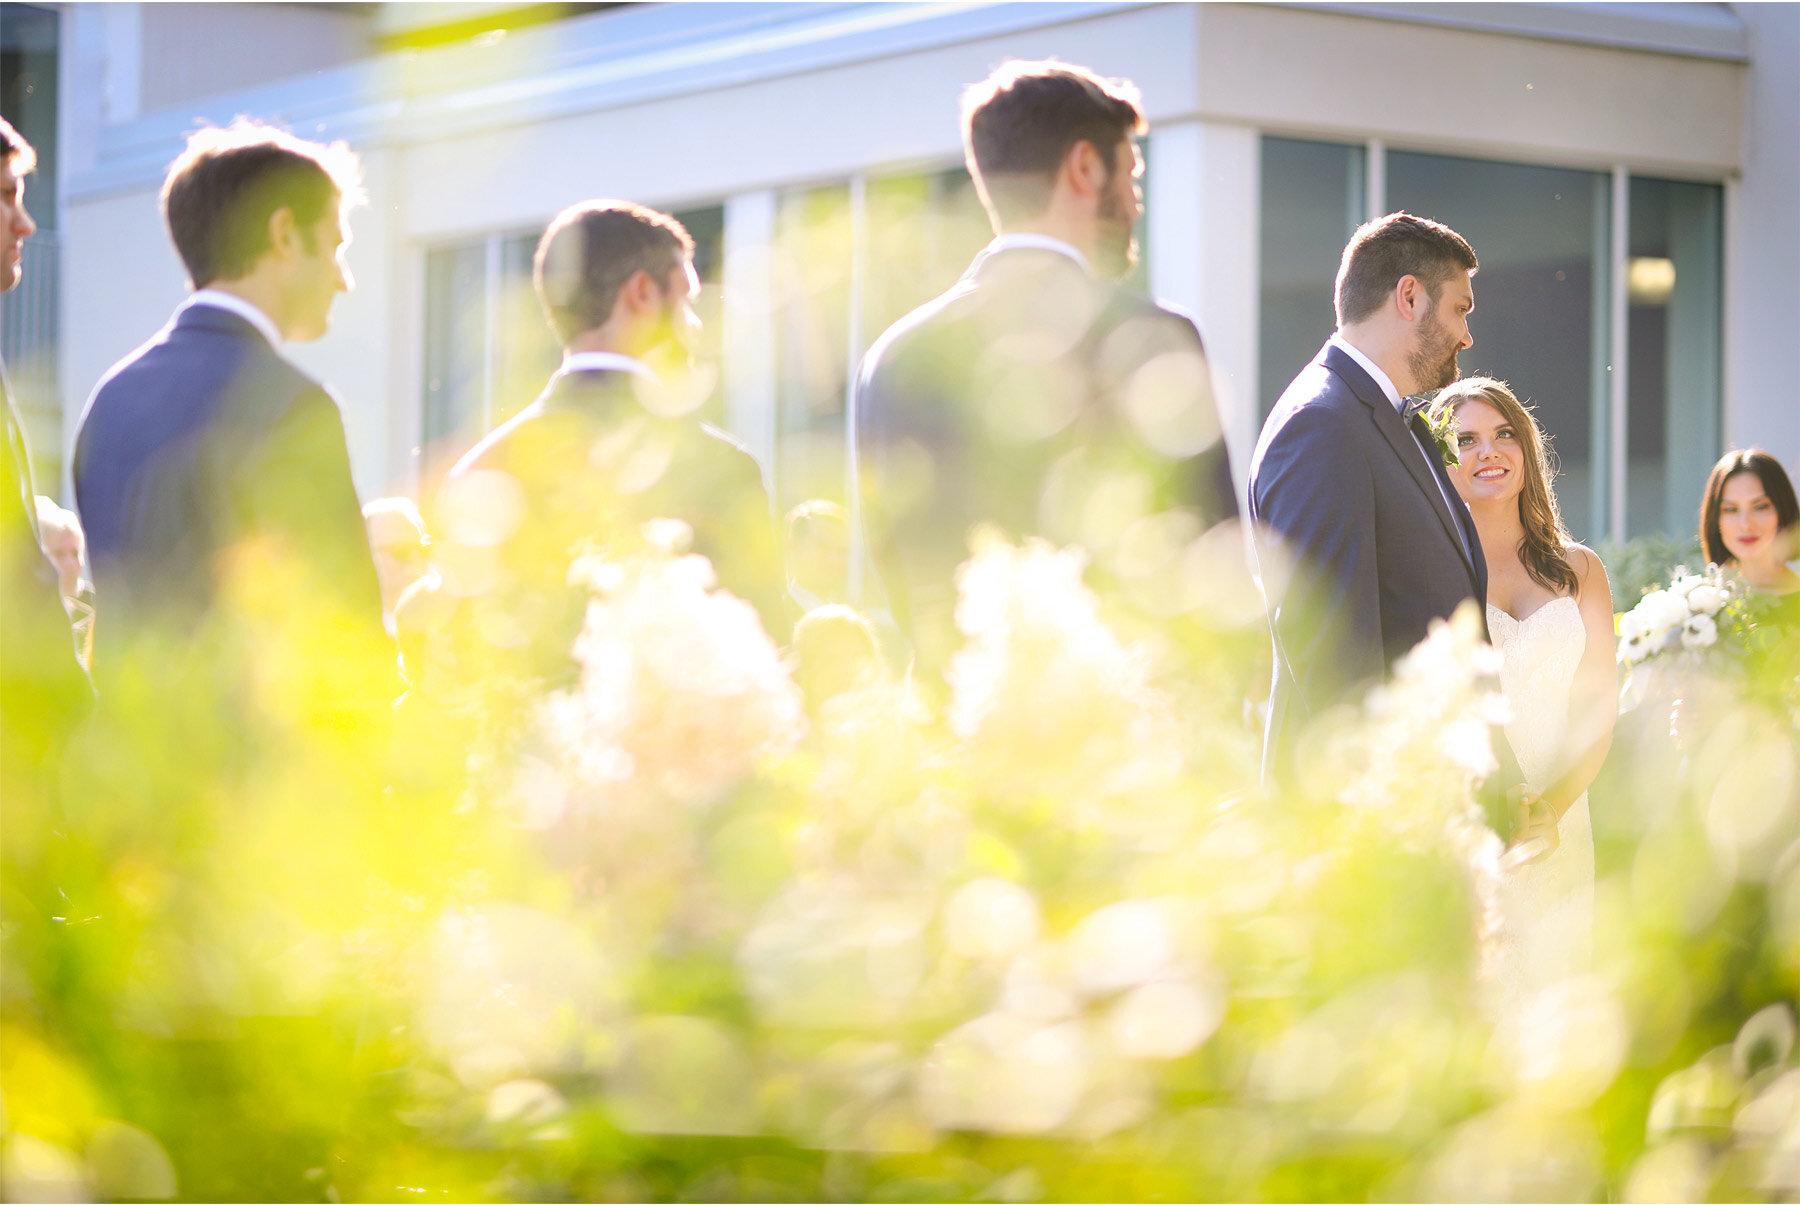 14-Vick-Photography-Wedding-Minnetonka-Minnesota-Lafayette-Club-Outdoor-Ceremony-Katie-and-David.jpg